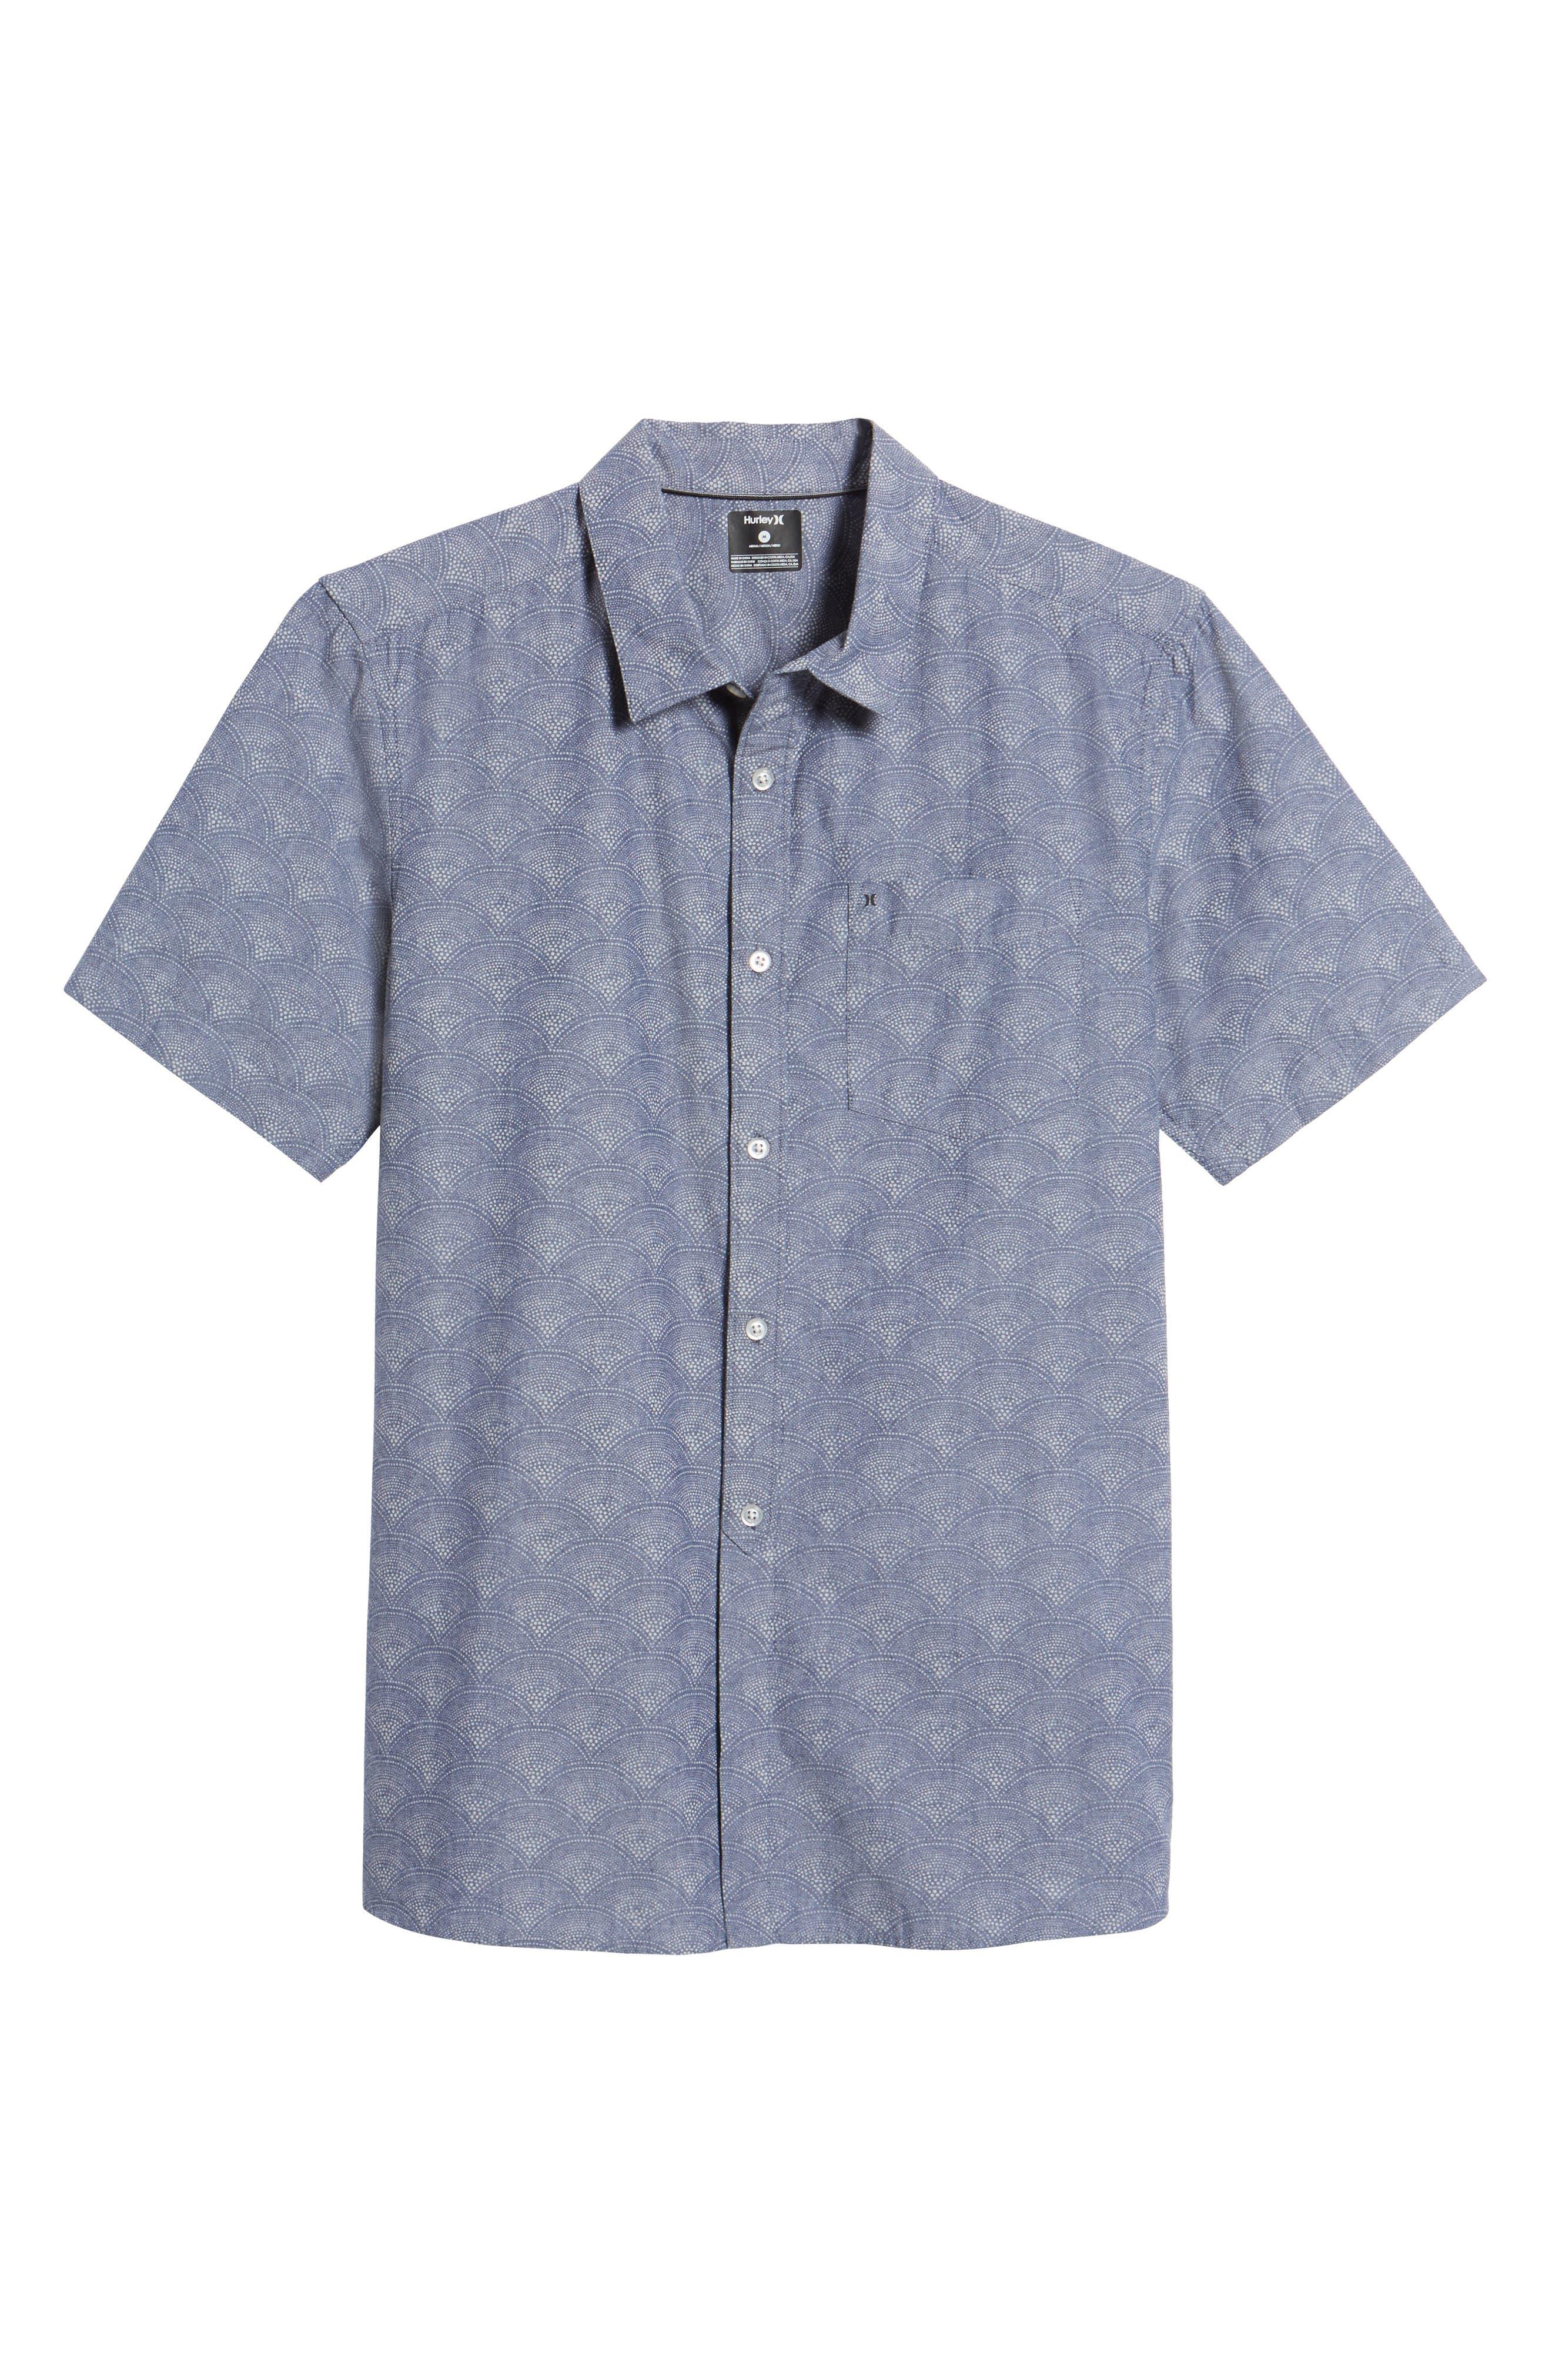 Pescado Short Sleeve Oxford Shirt,                             Alternate thumbnail 6, color,                             Obsidian